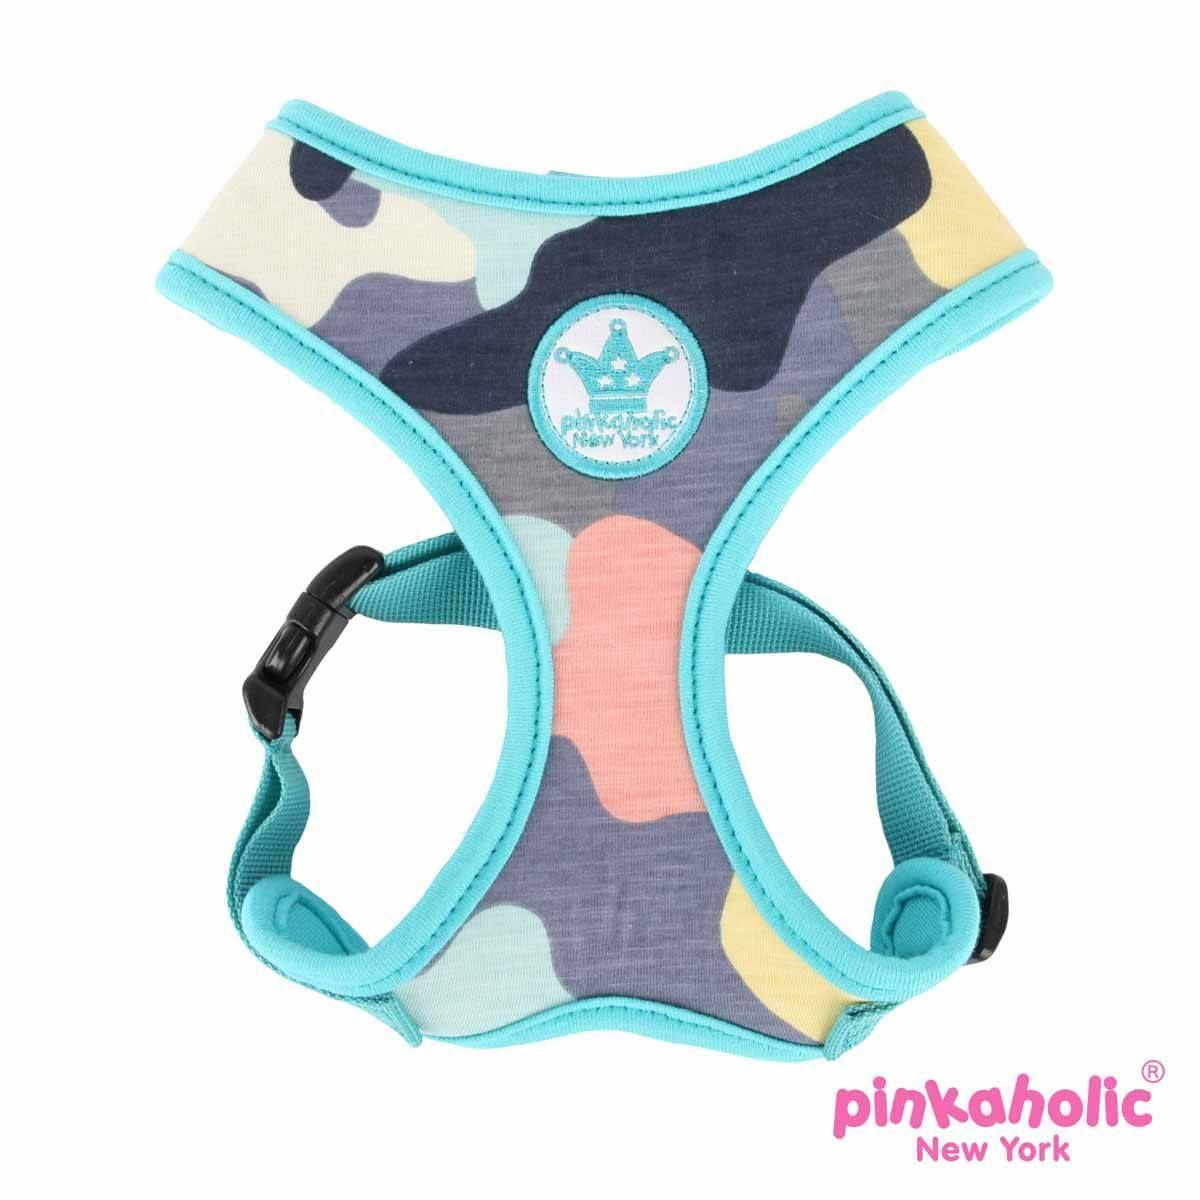 Delta Adjustable Dog Harness by Pinkaholic - Aqua